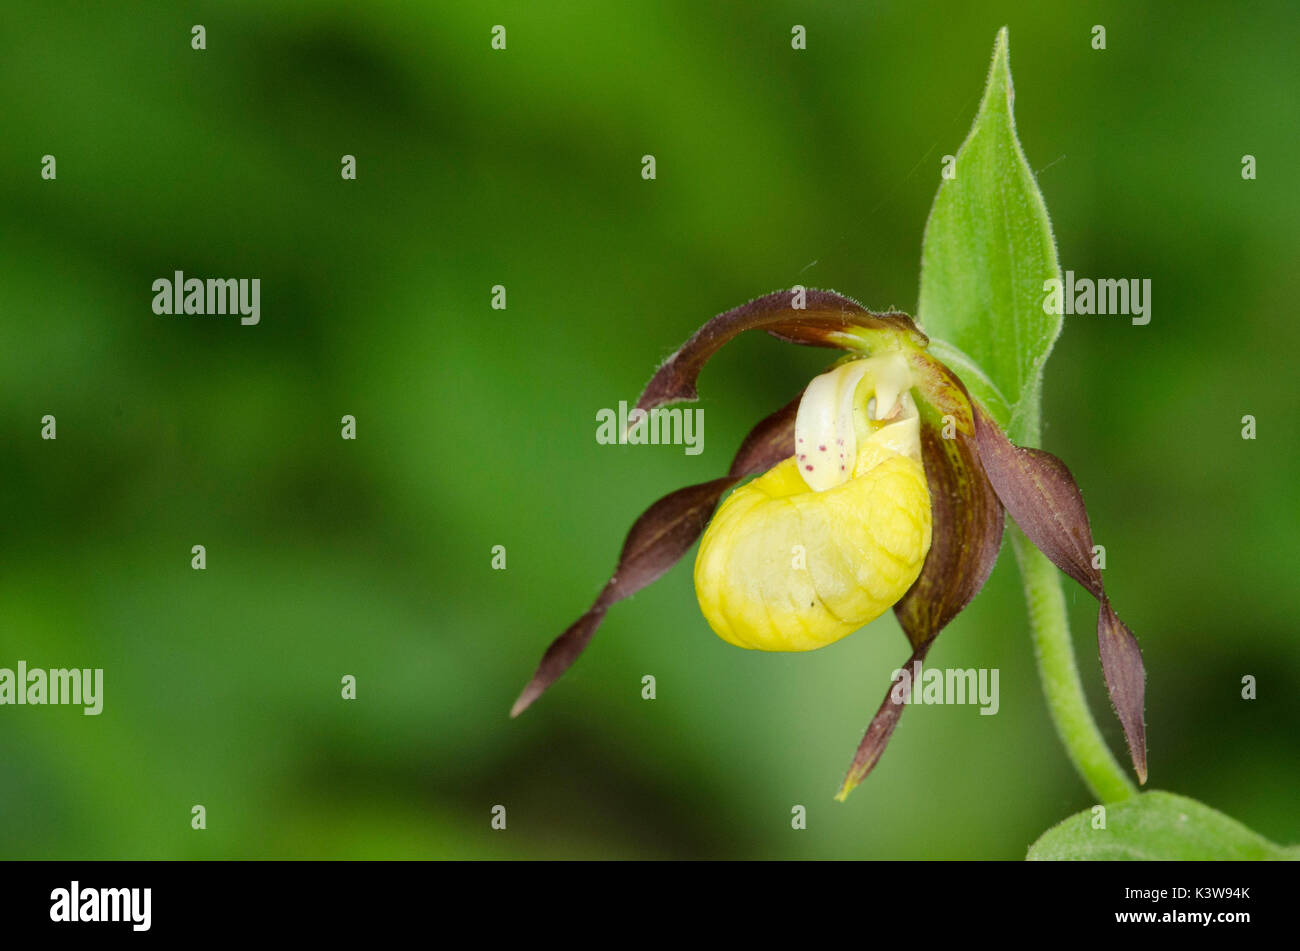 Wil orchid, Cypripedium calceolus - Stock Image